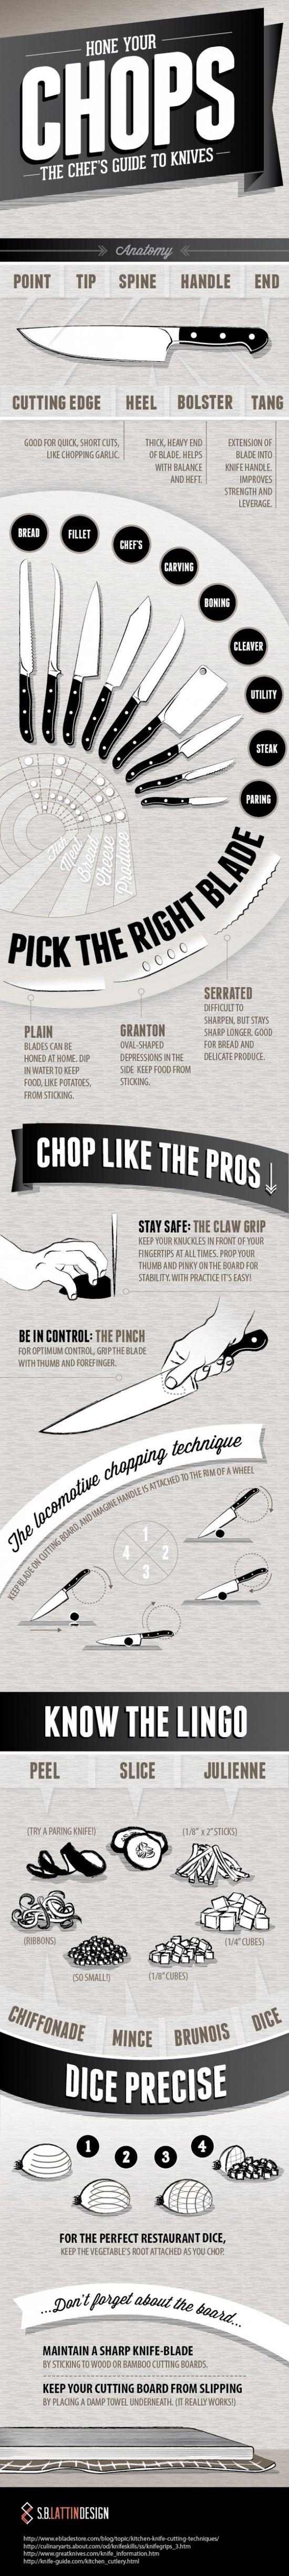 Knife basics and tips